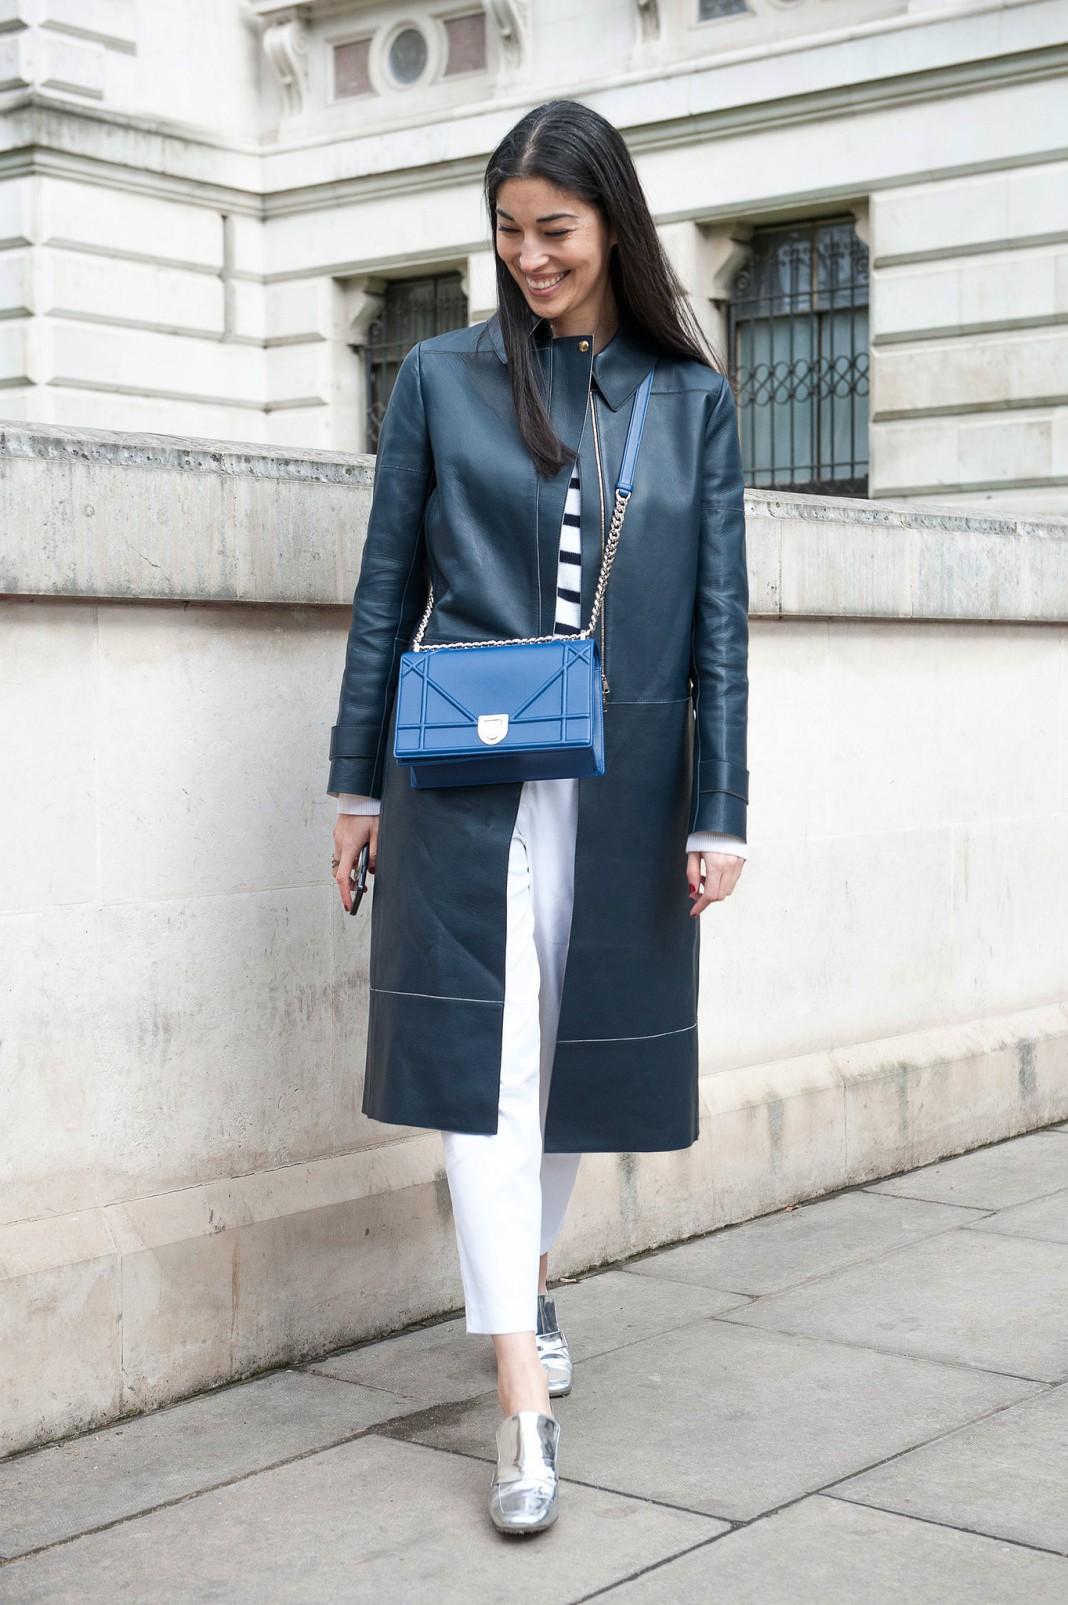 London fashion trends winter 2018 45